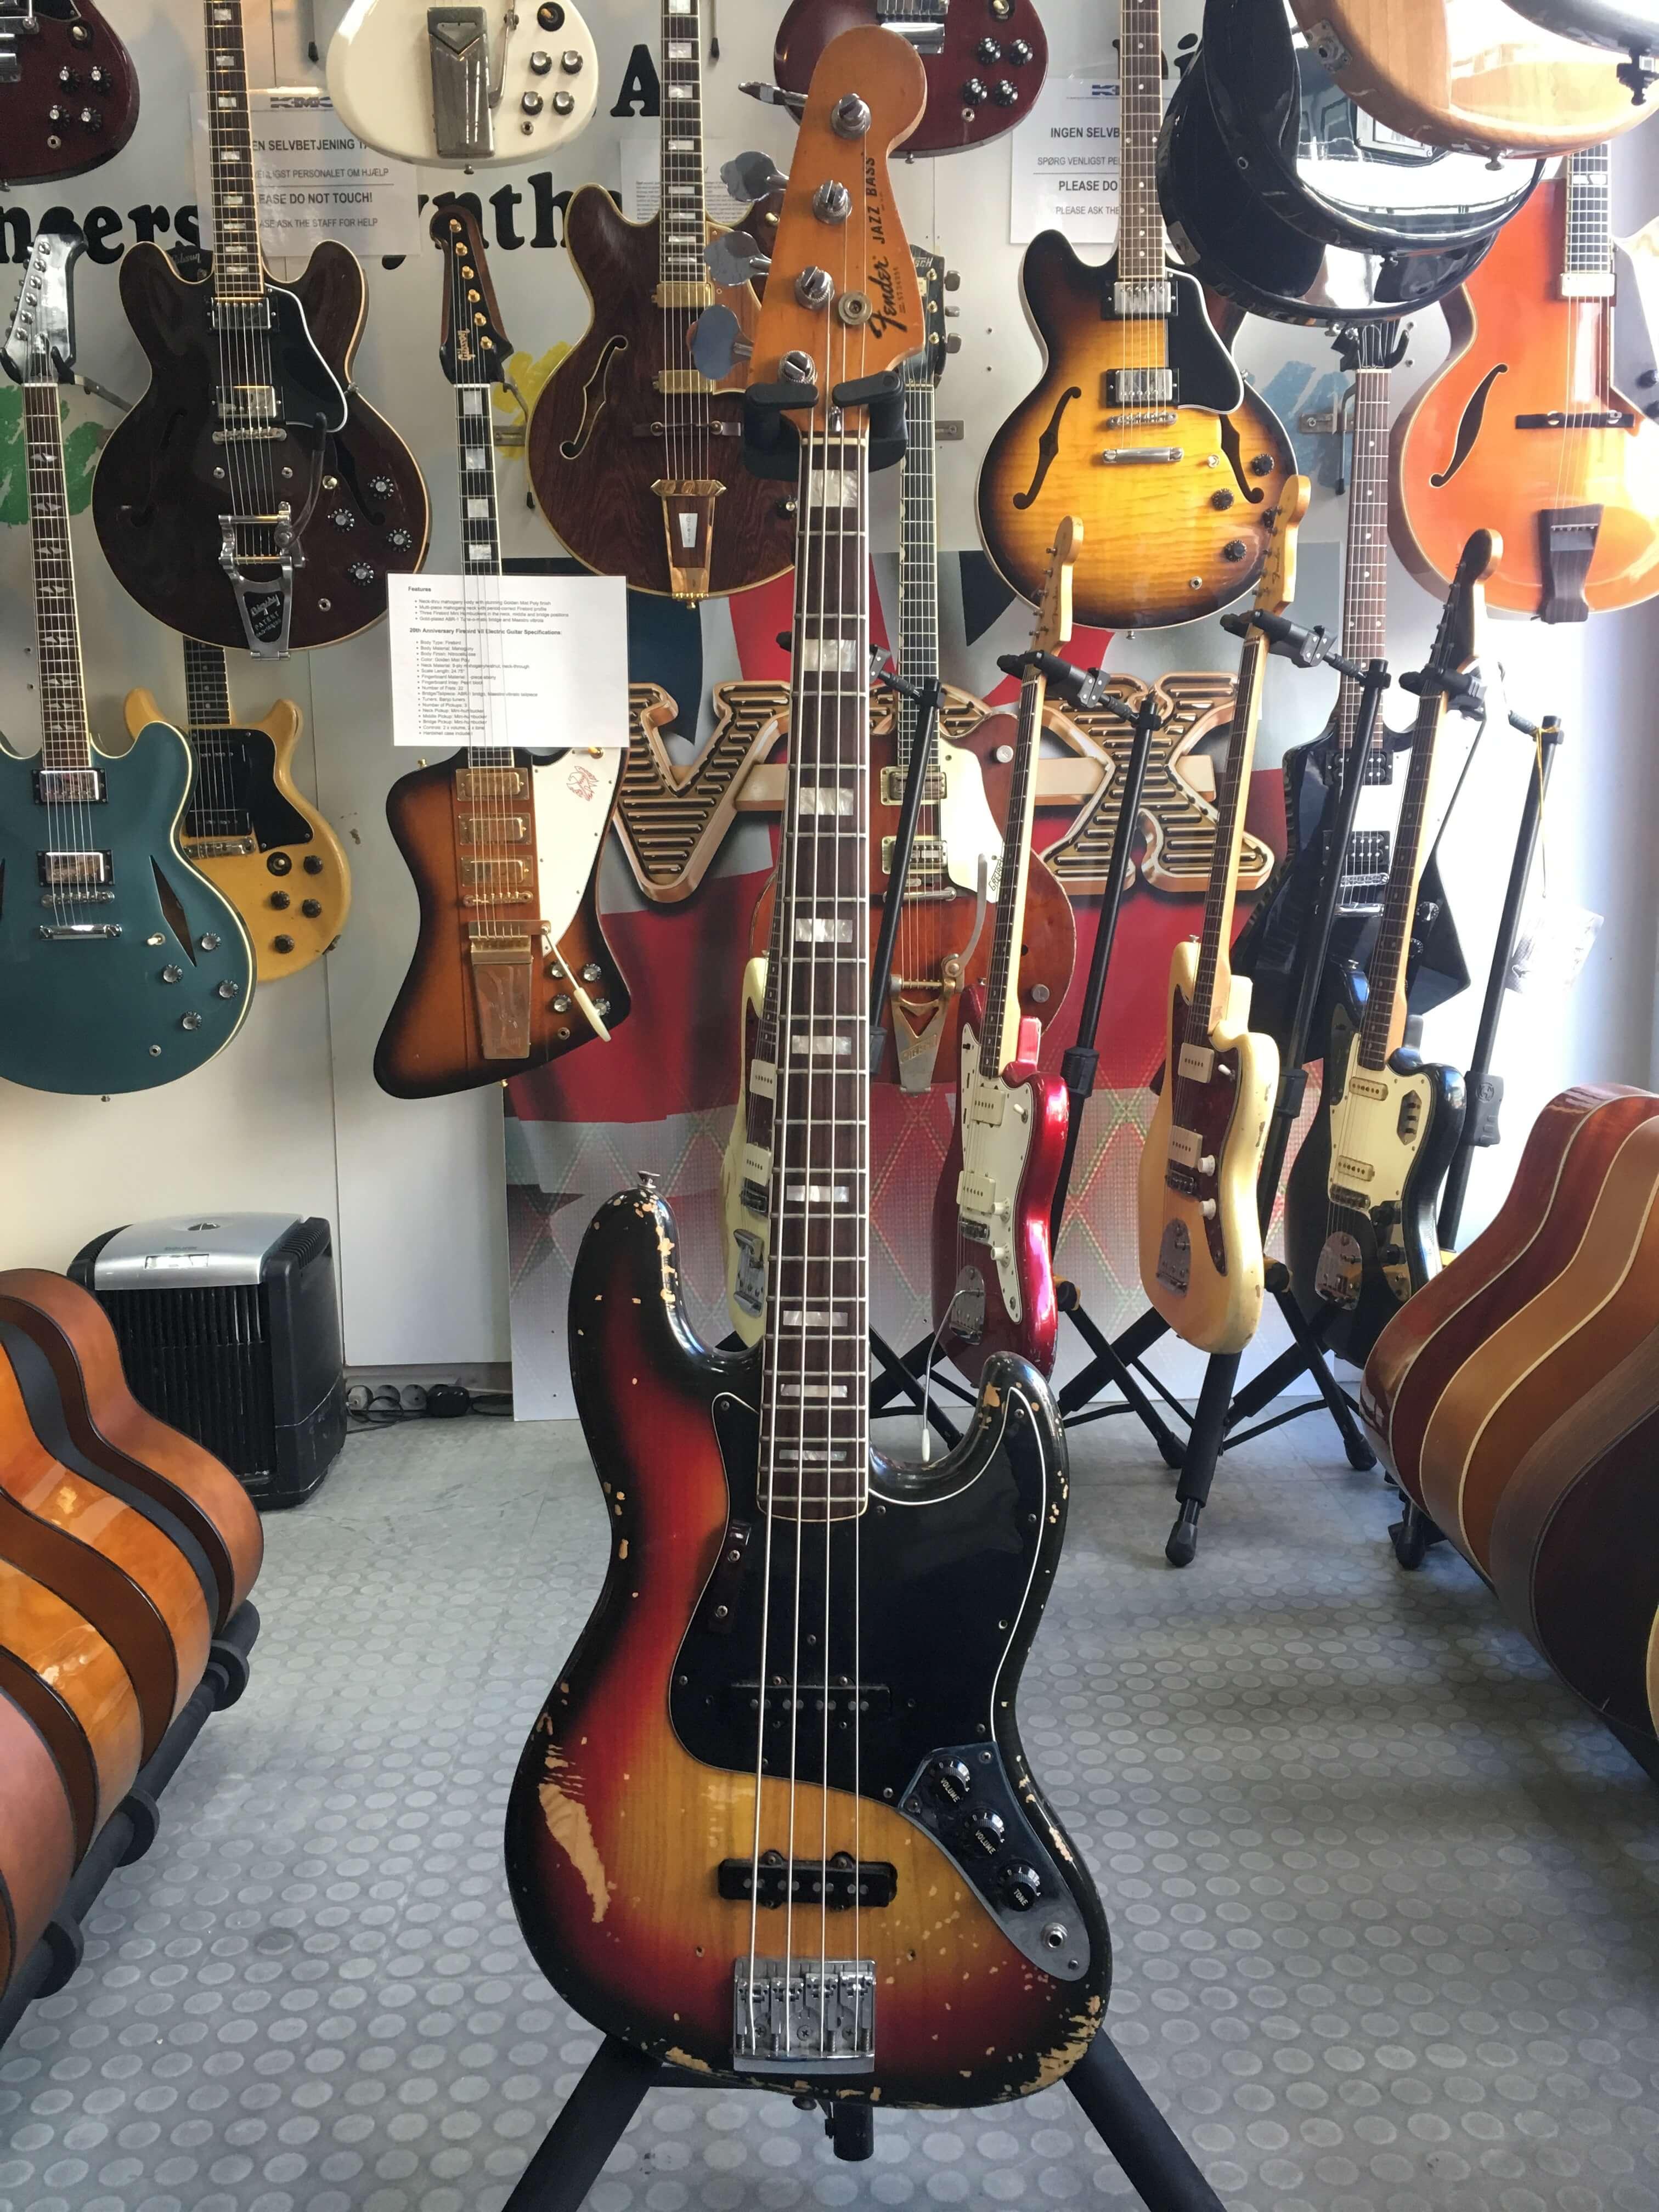 Fender Jazz bass US 1977